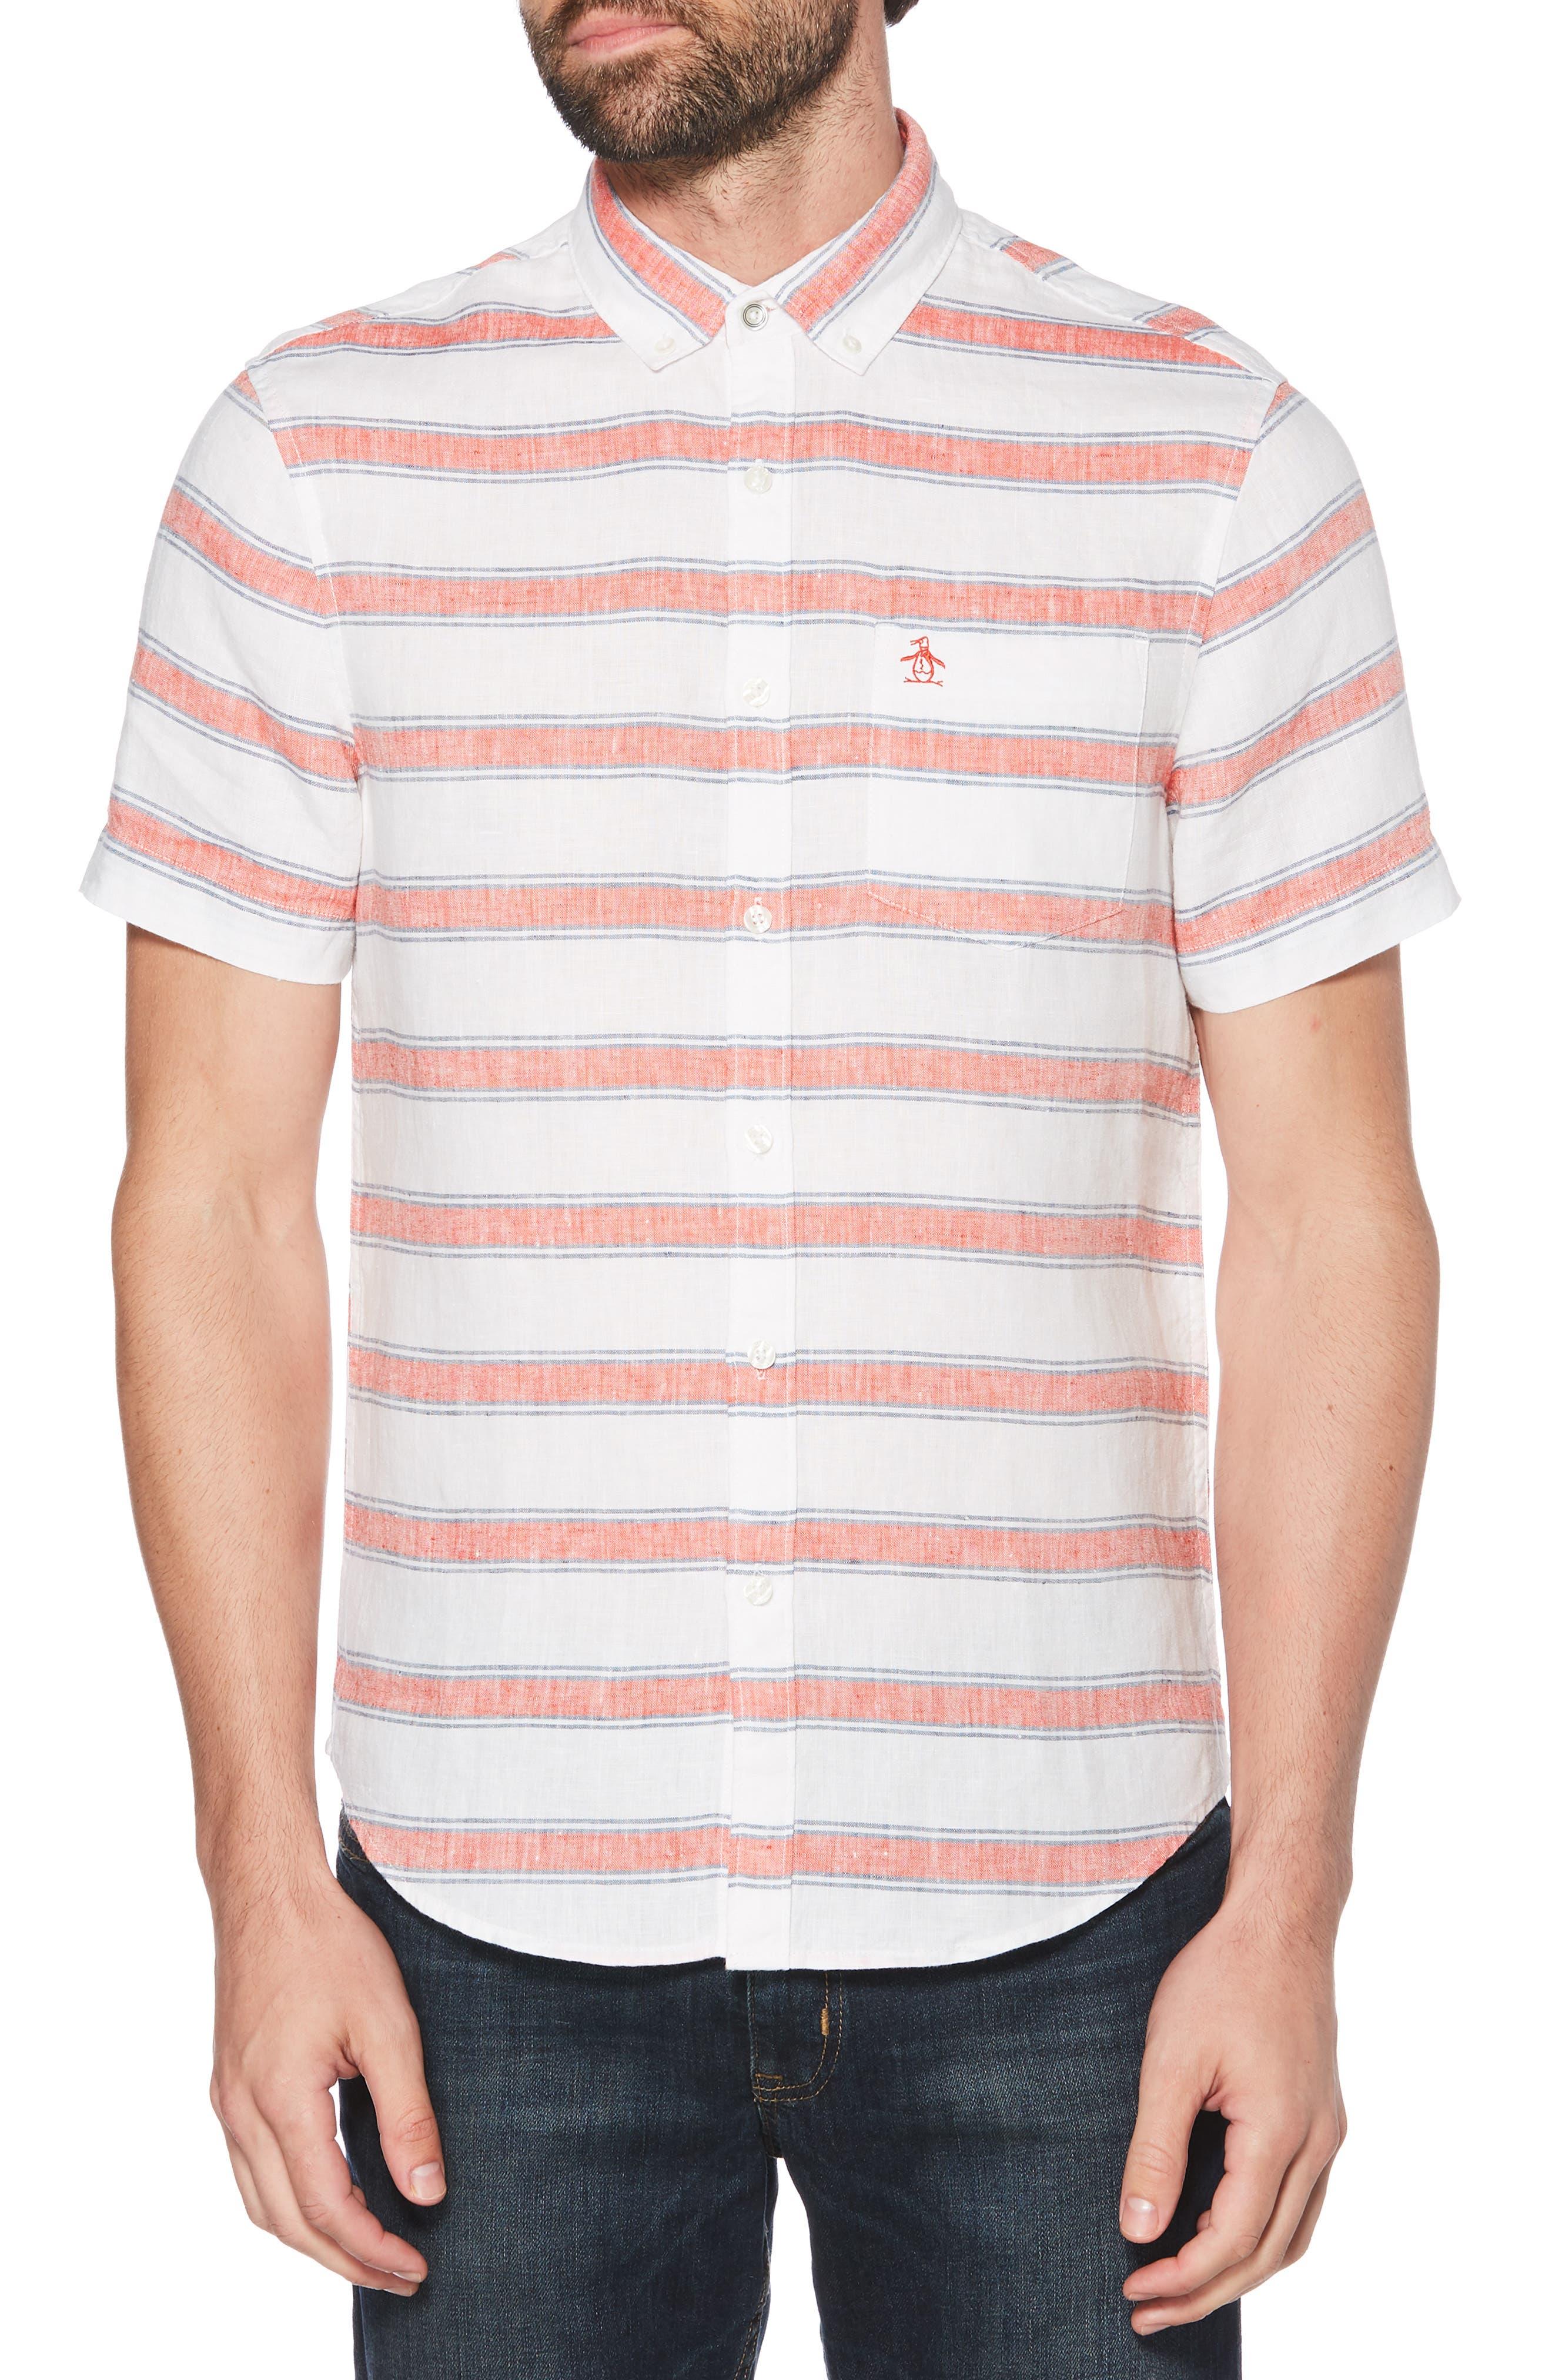 ORIGINAL PENGUIN Horizontal Stripe Linen Shirt, Main, color, BRIGHT WHITE